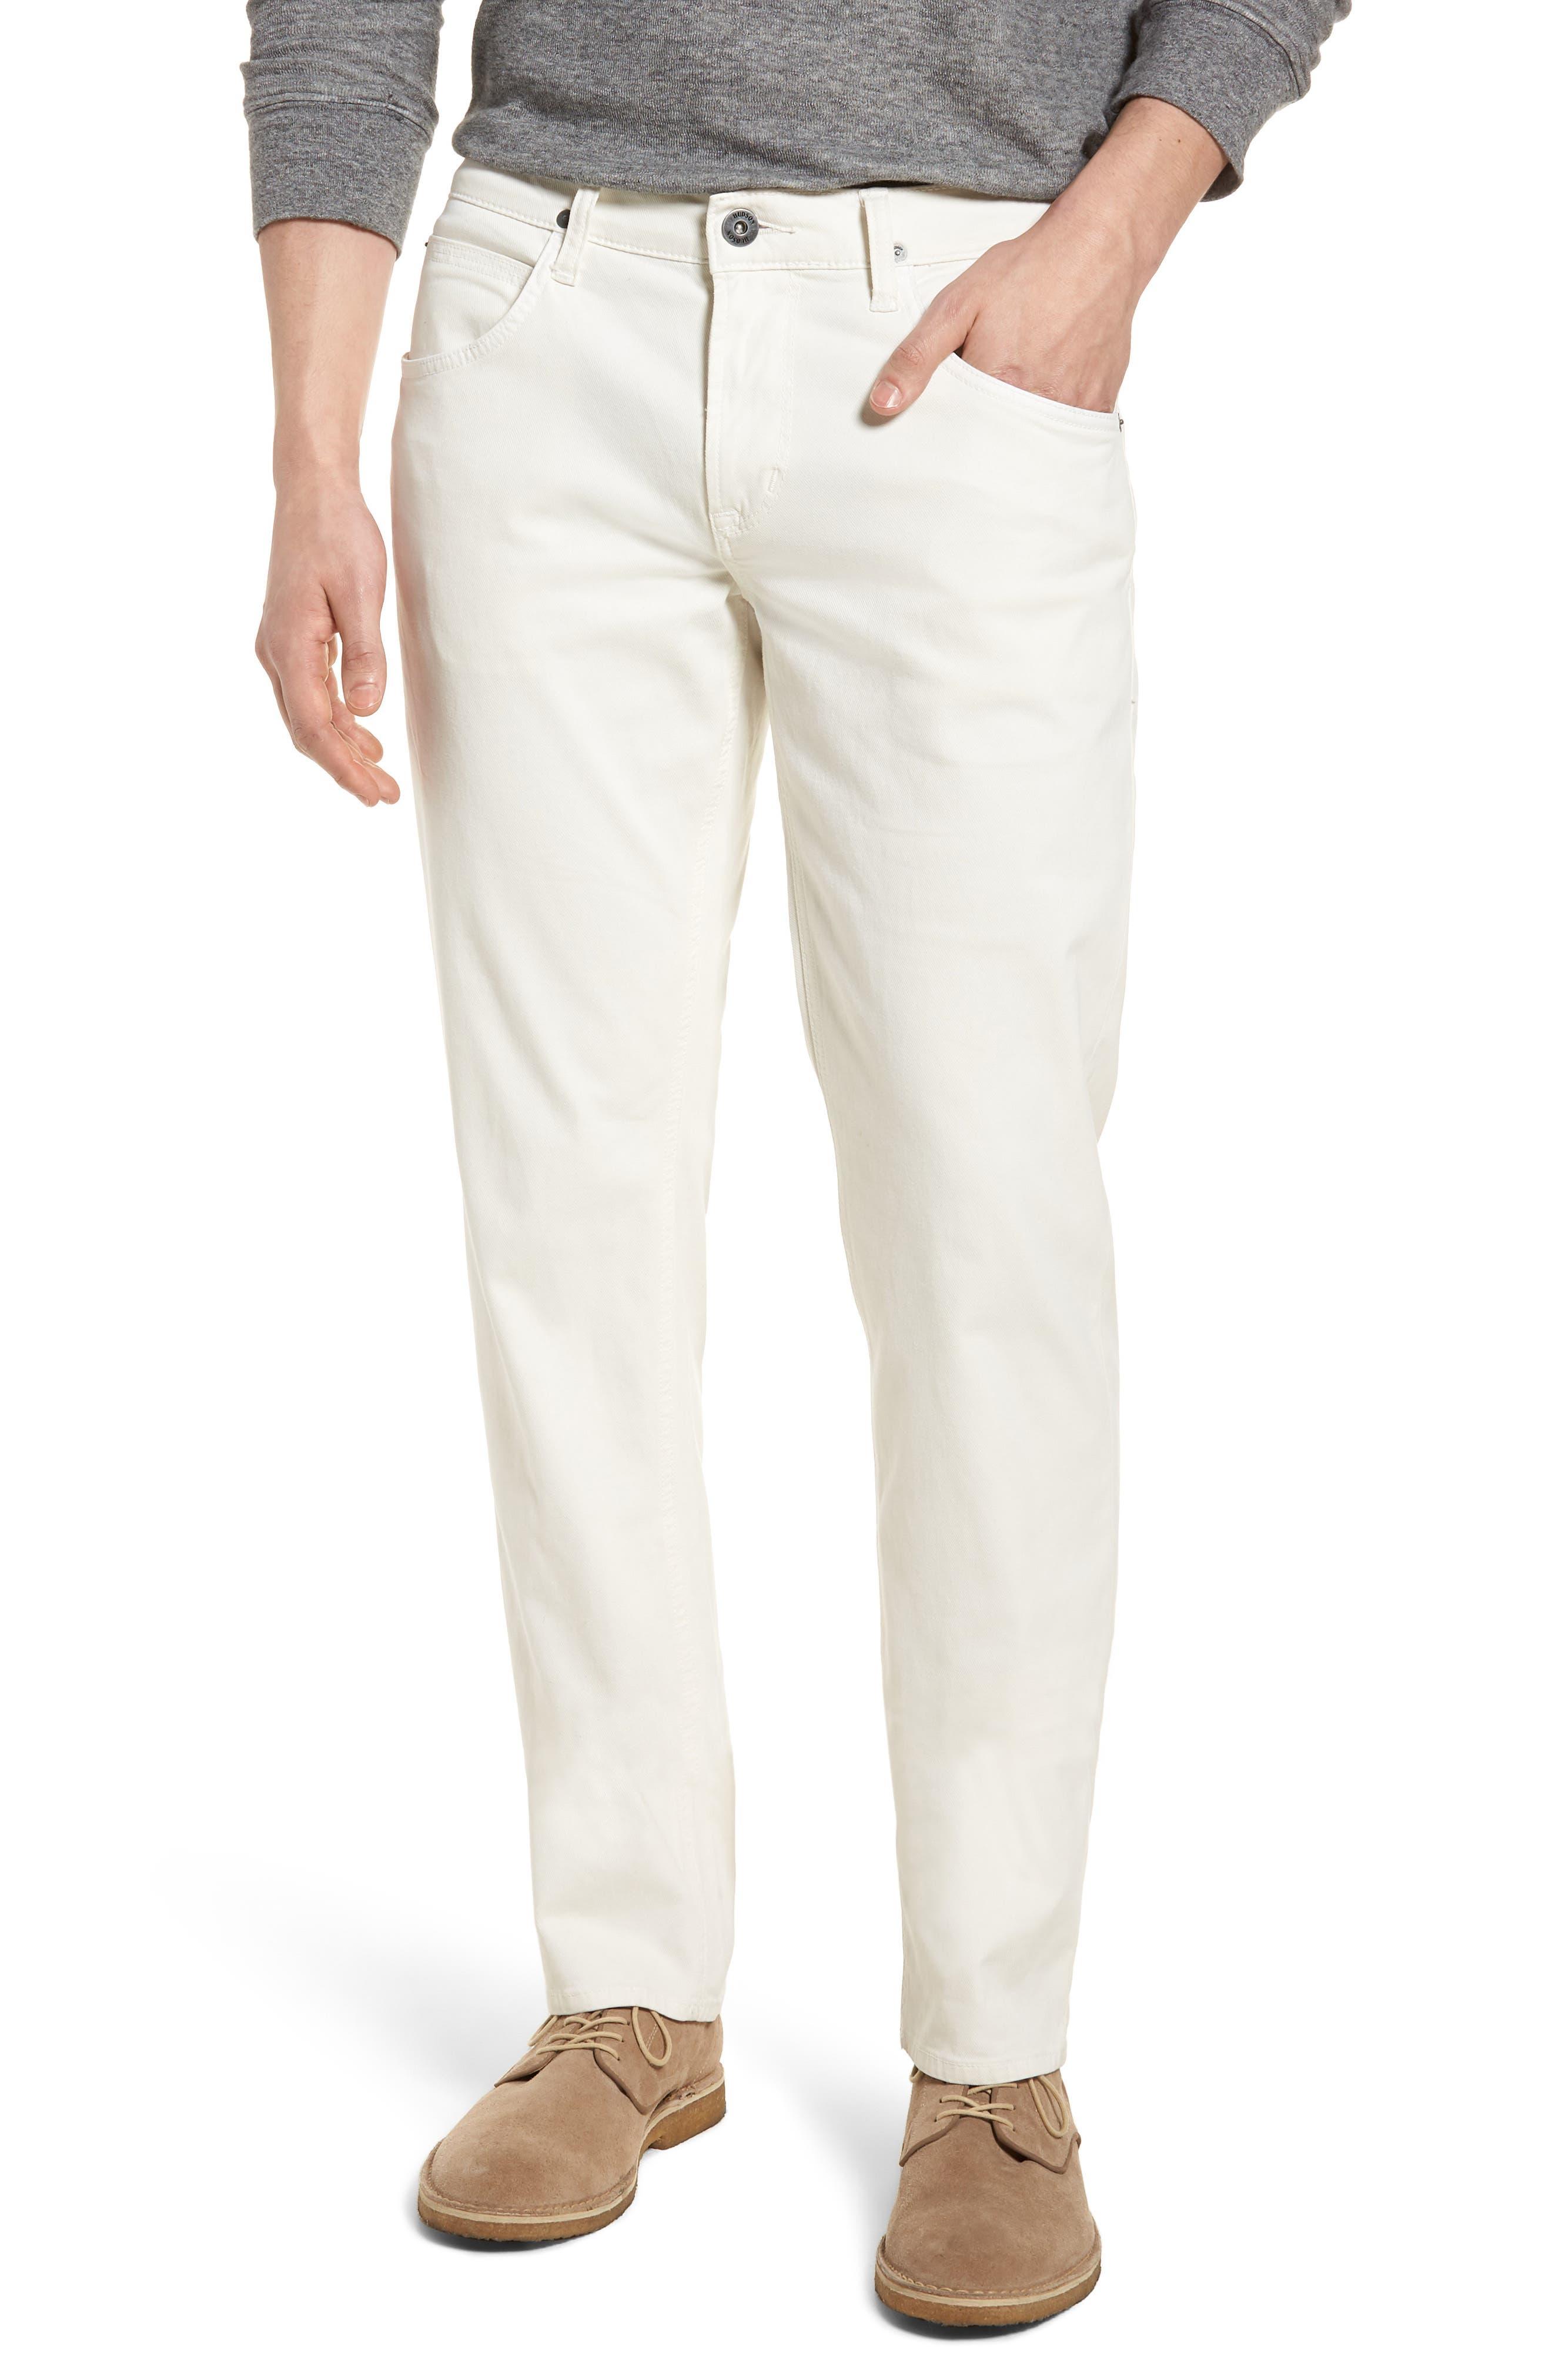 Blake Slim Fit Jeans,                             Main thumbnail 1, color,                             110